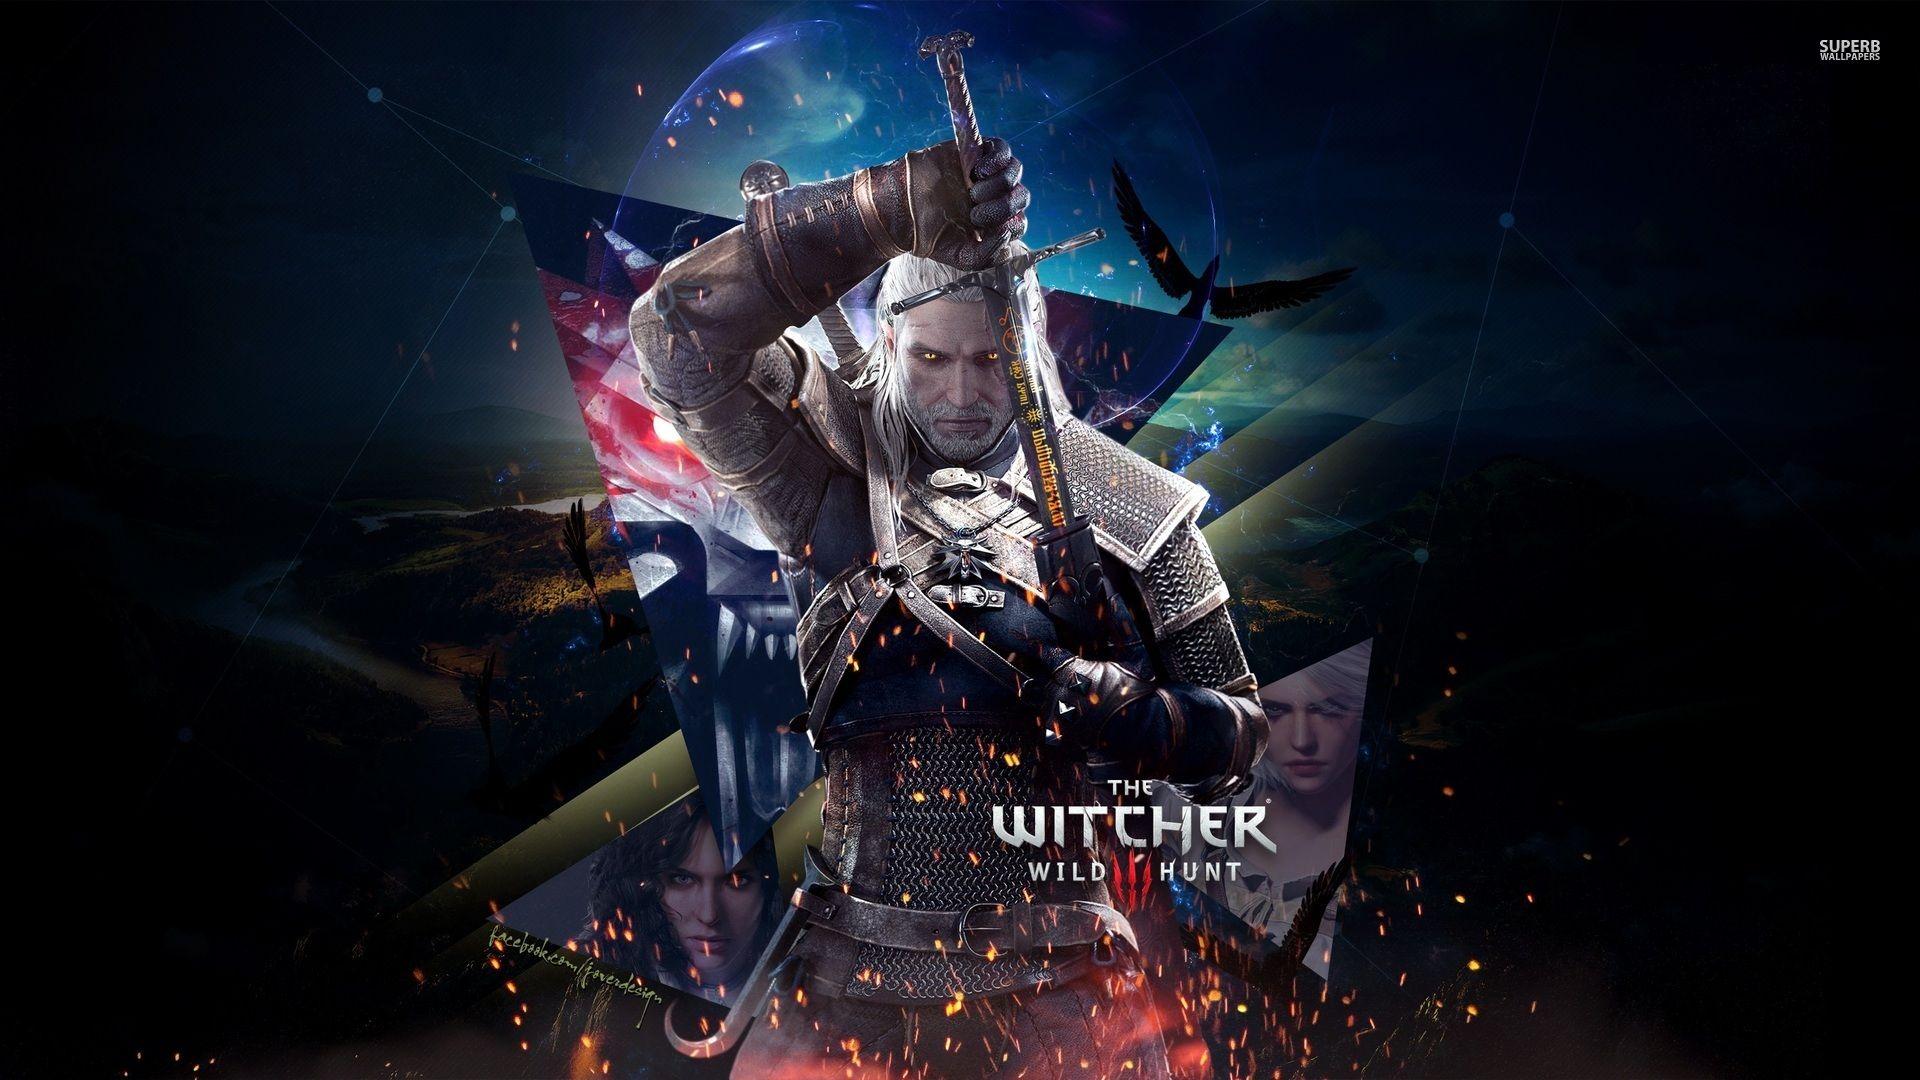 The Witcher 3 Wallpaper wallpaper. The witcher